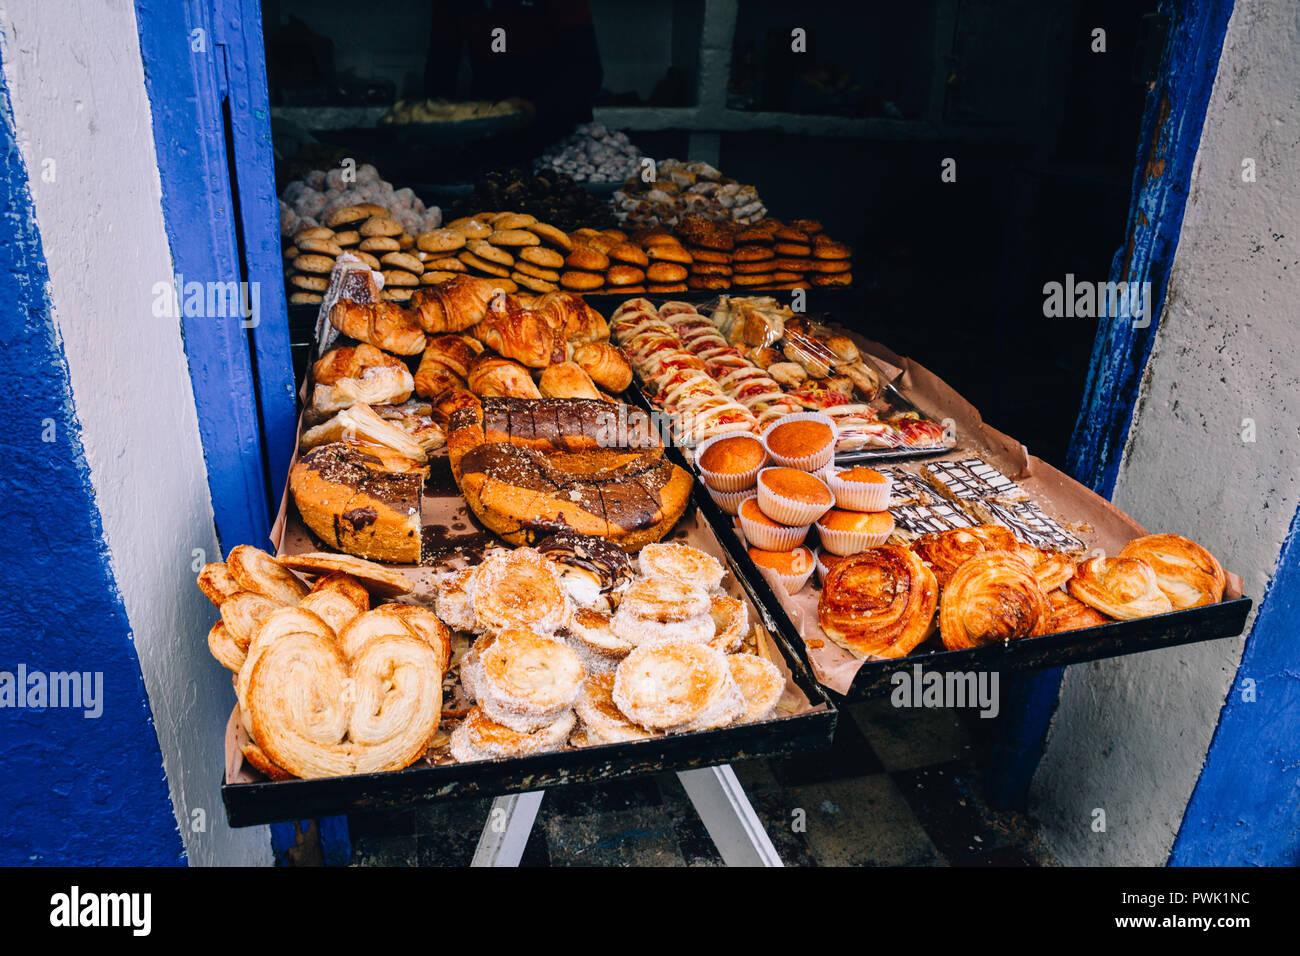 Chefchaouen, Morocco, 2018 Stock Photo